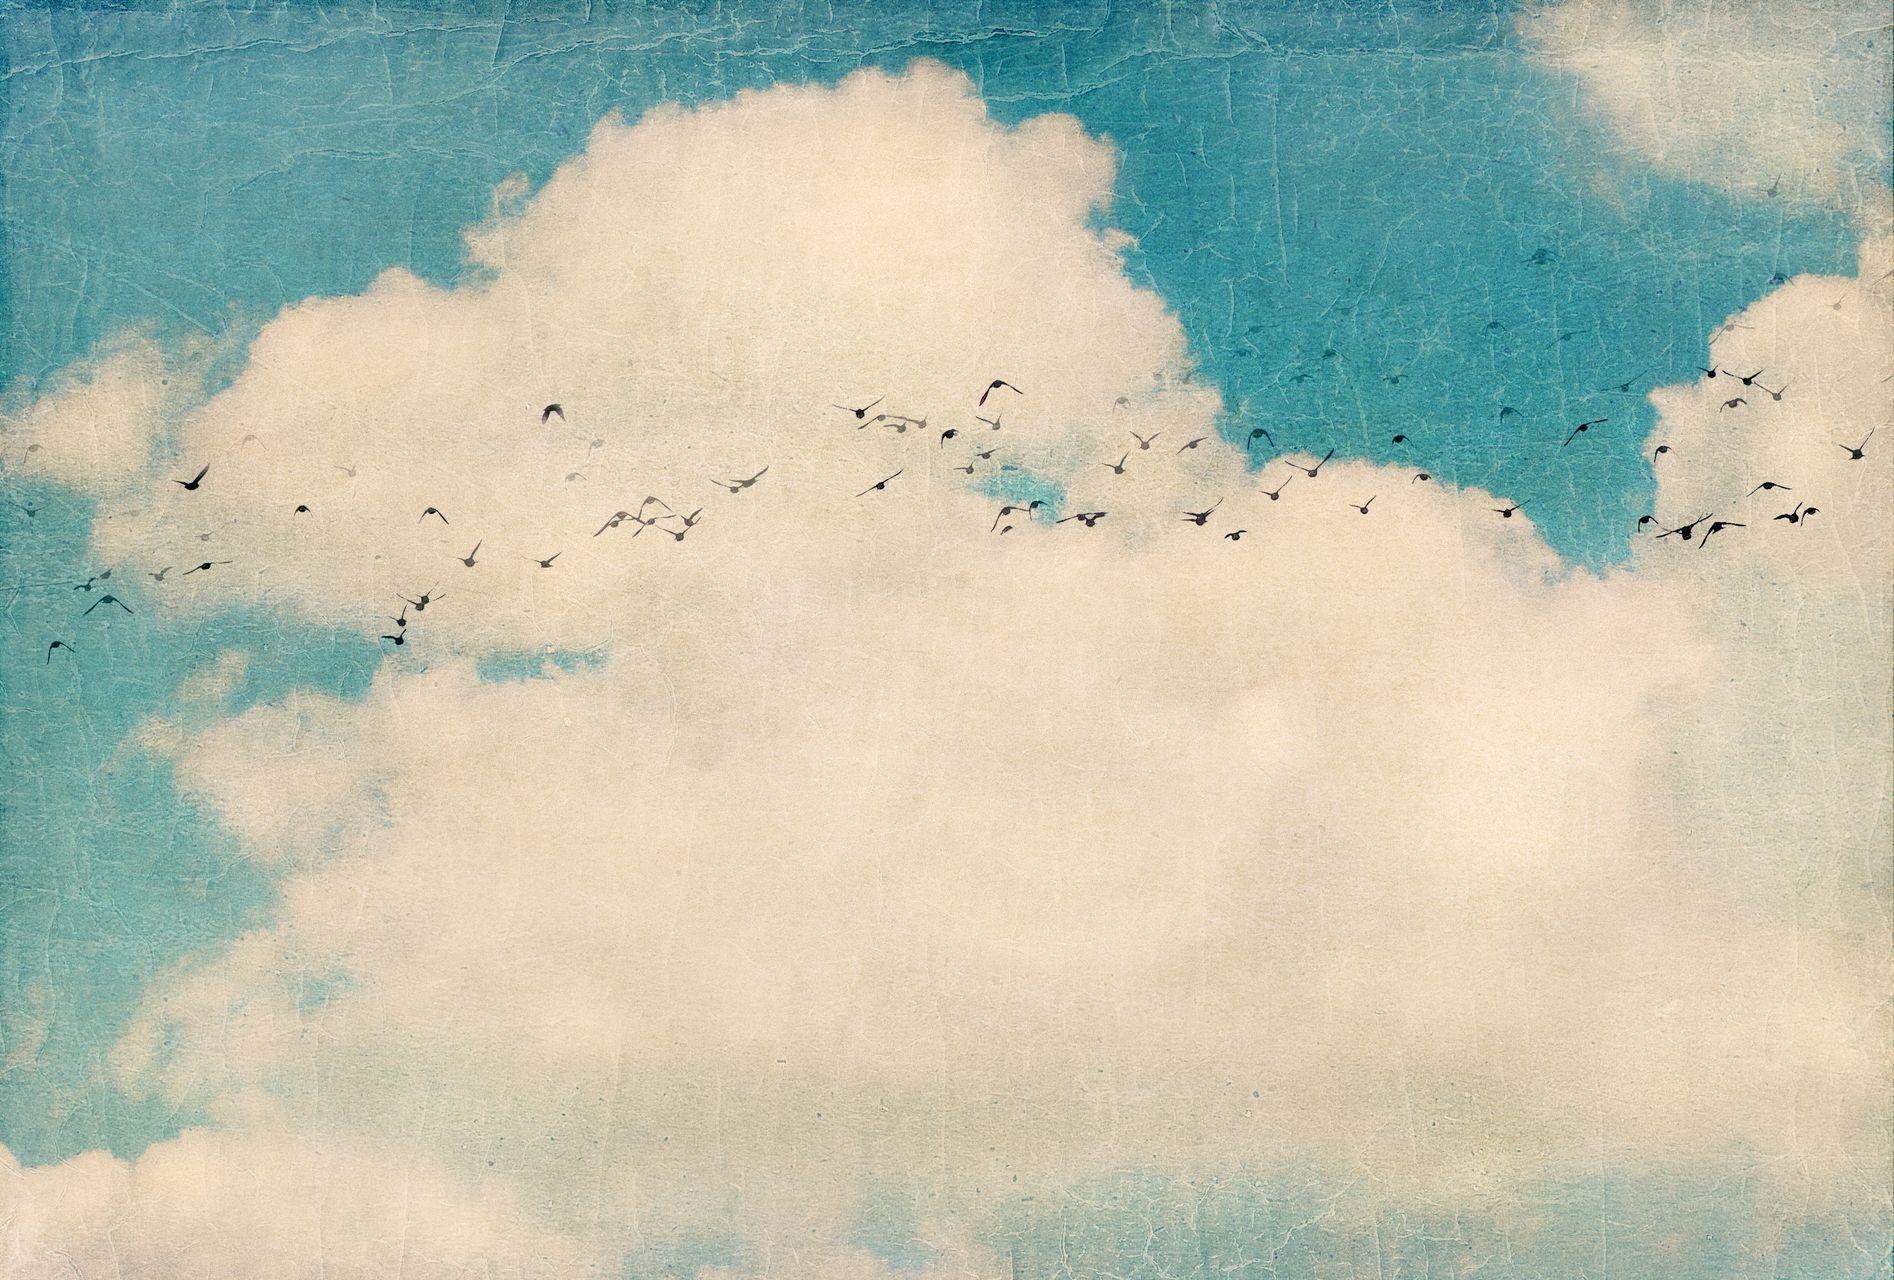 Vintage Clouds Cloud Illustration Art Abstract Artwork